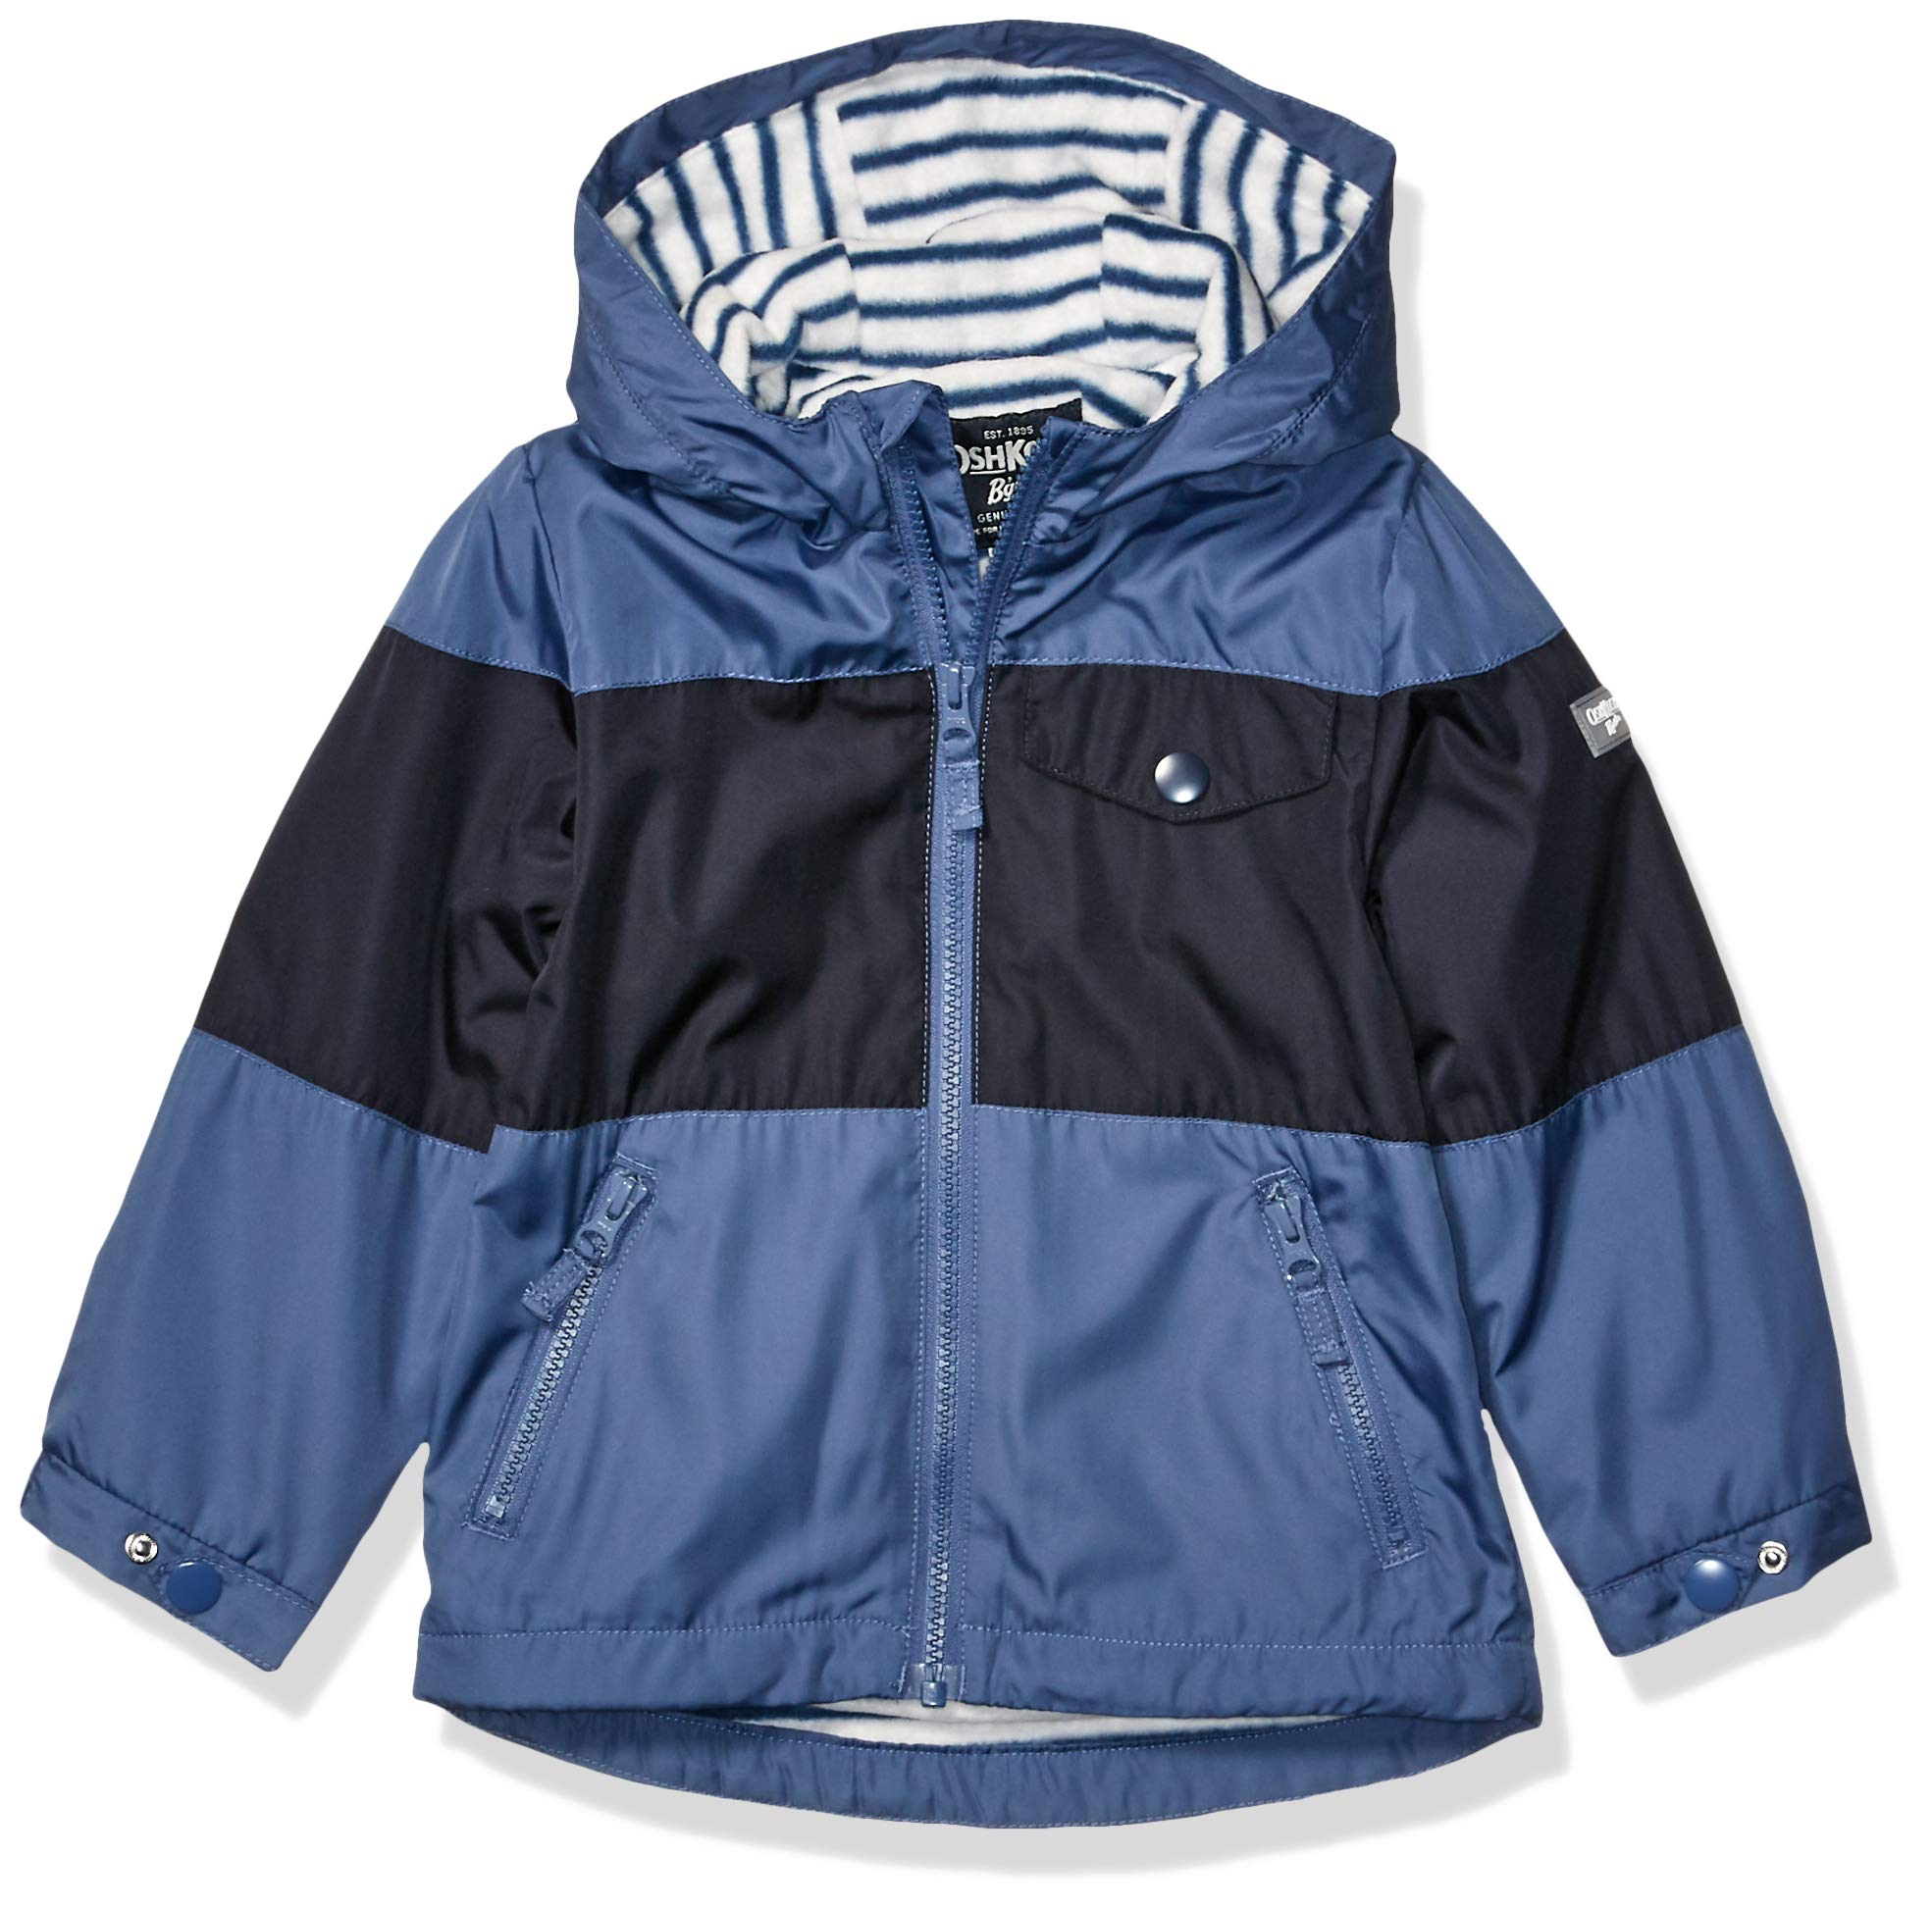 Osh Kosh Boys' Little Midweight Jersey Lined Jacket, Blue Black Color Block, 7 by OshKosh B'Gosh